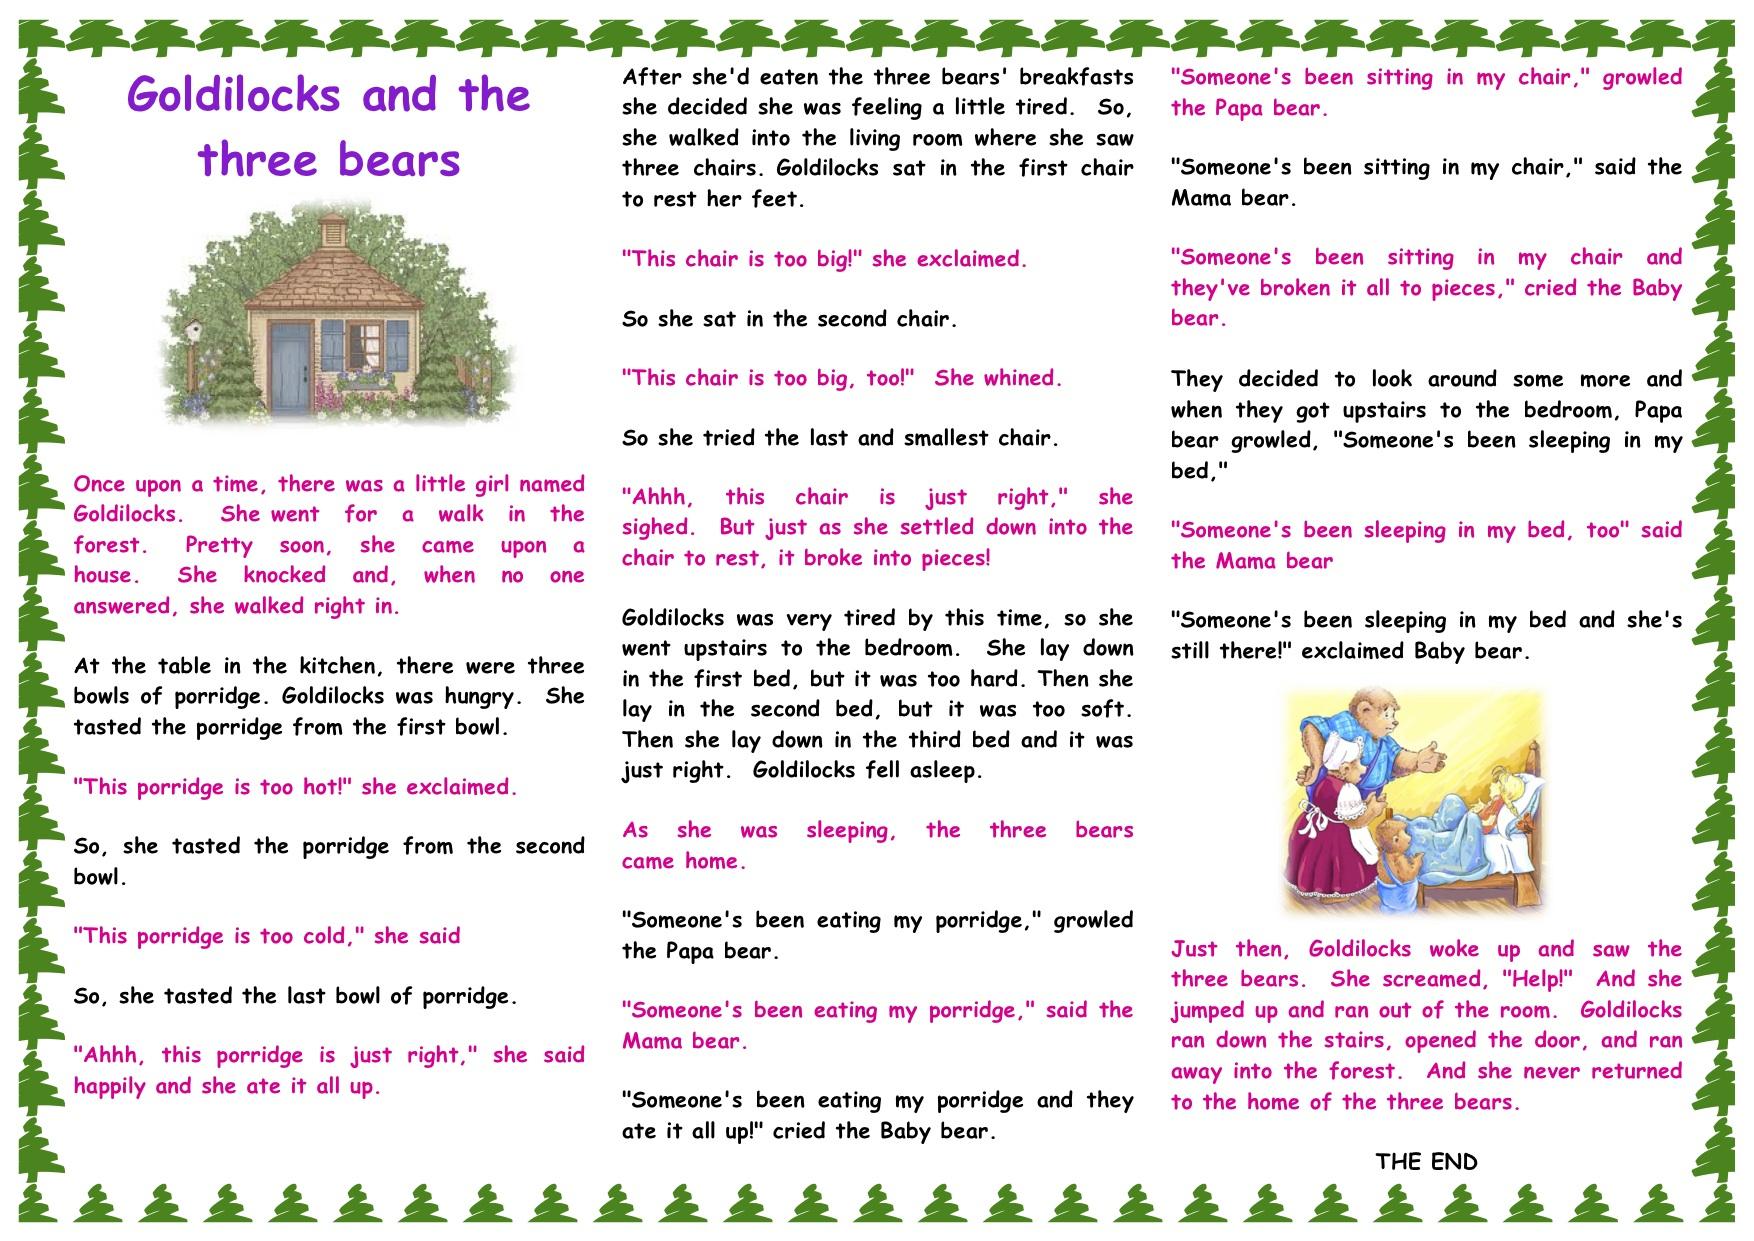 Goldilocks And The Three Bears Story Printable - Free Printable Goldilocks And The Three Bears Story